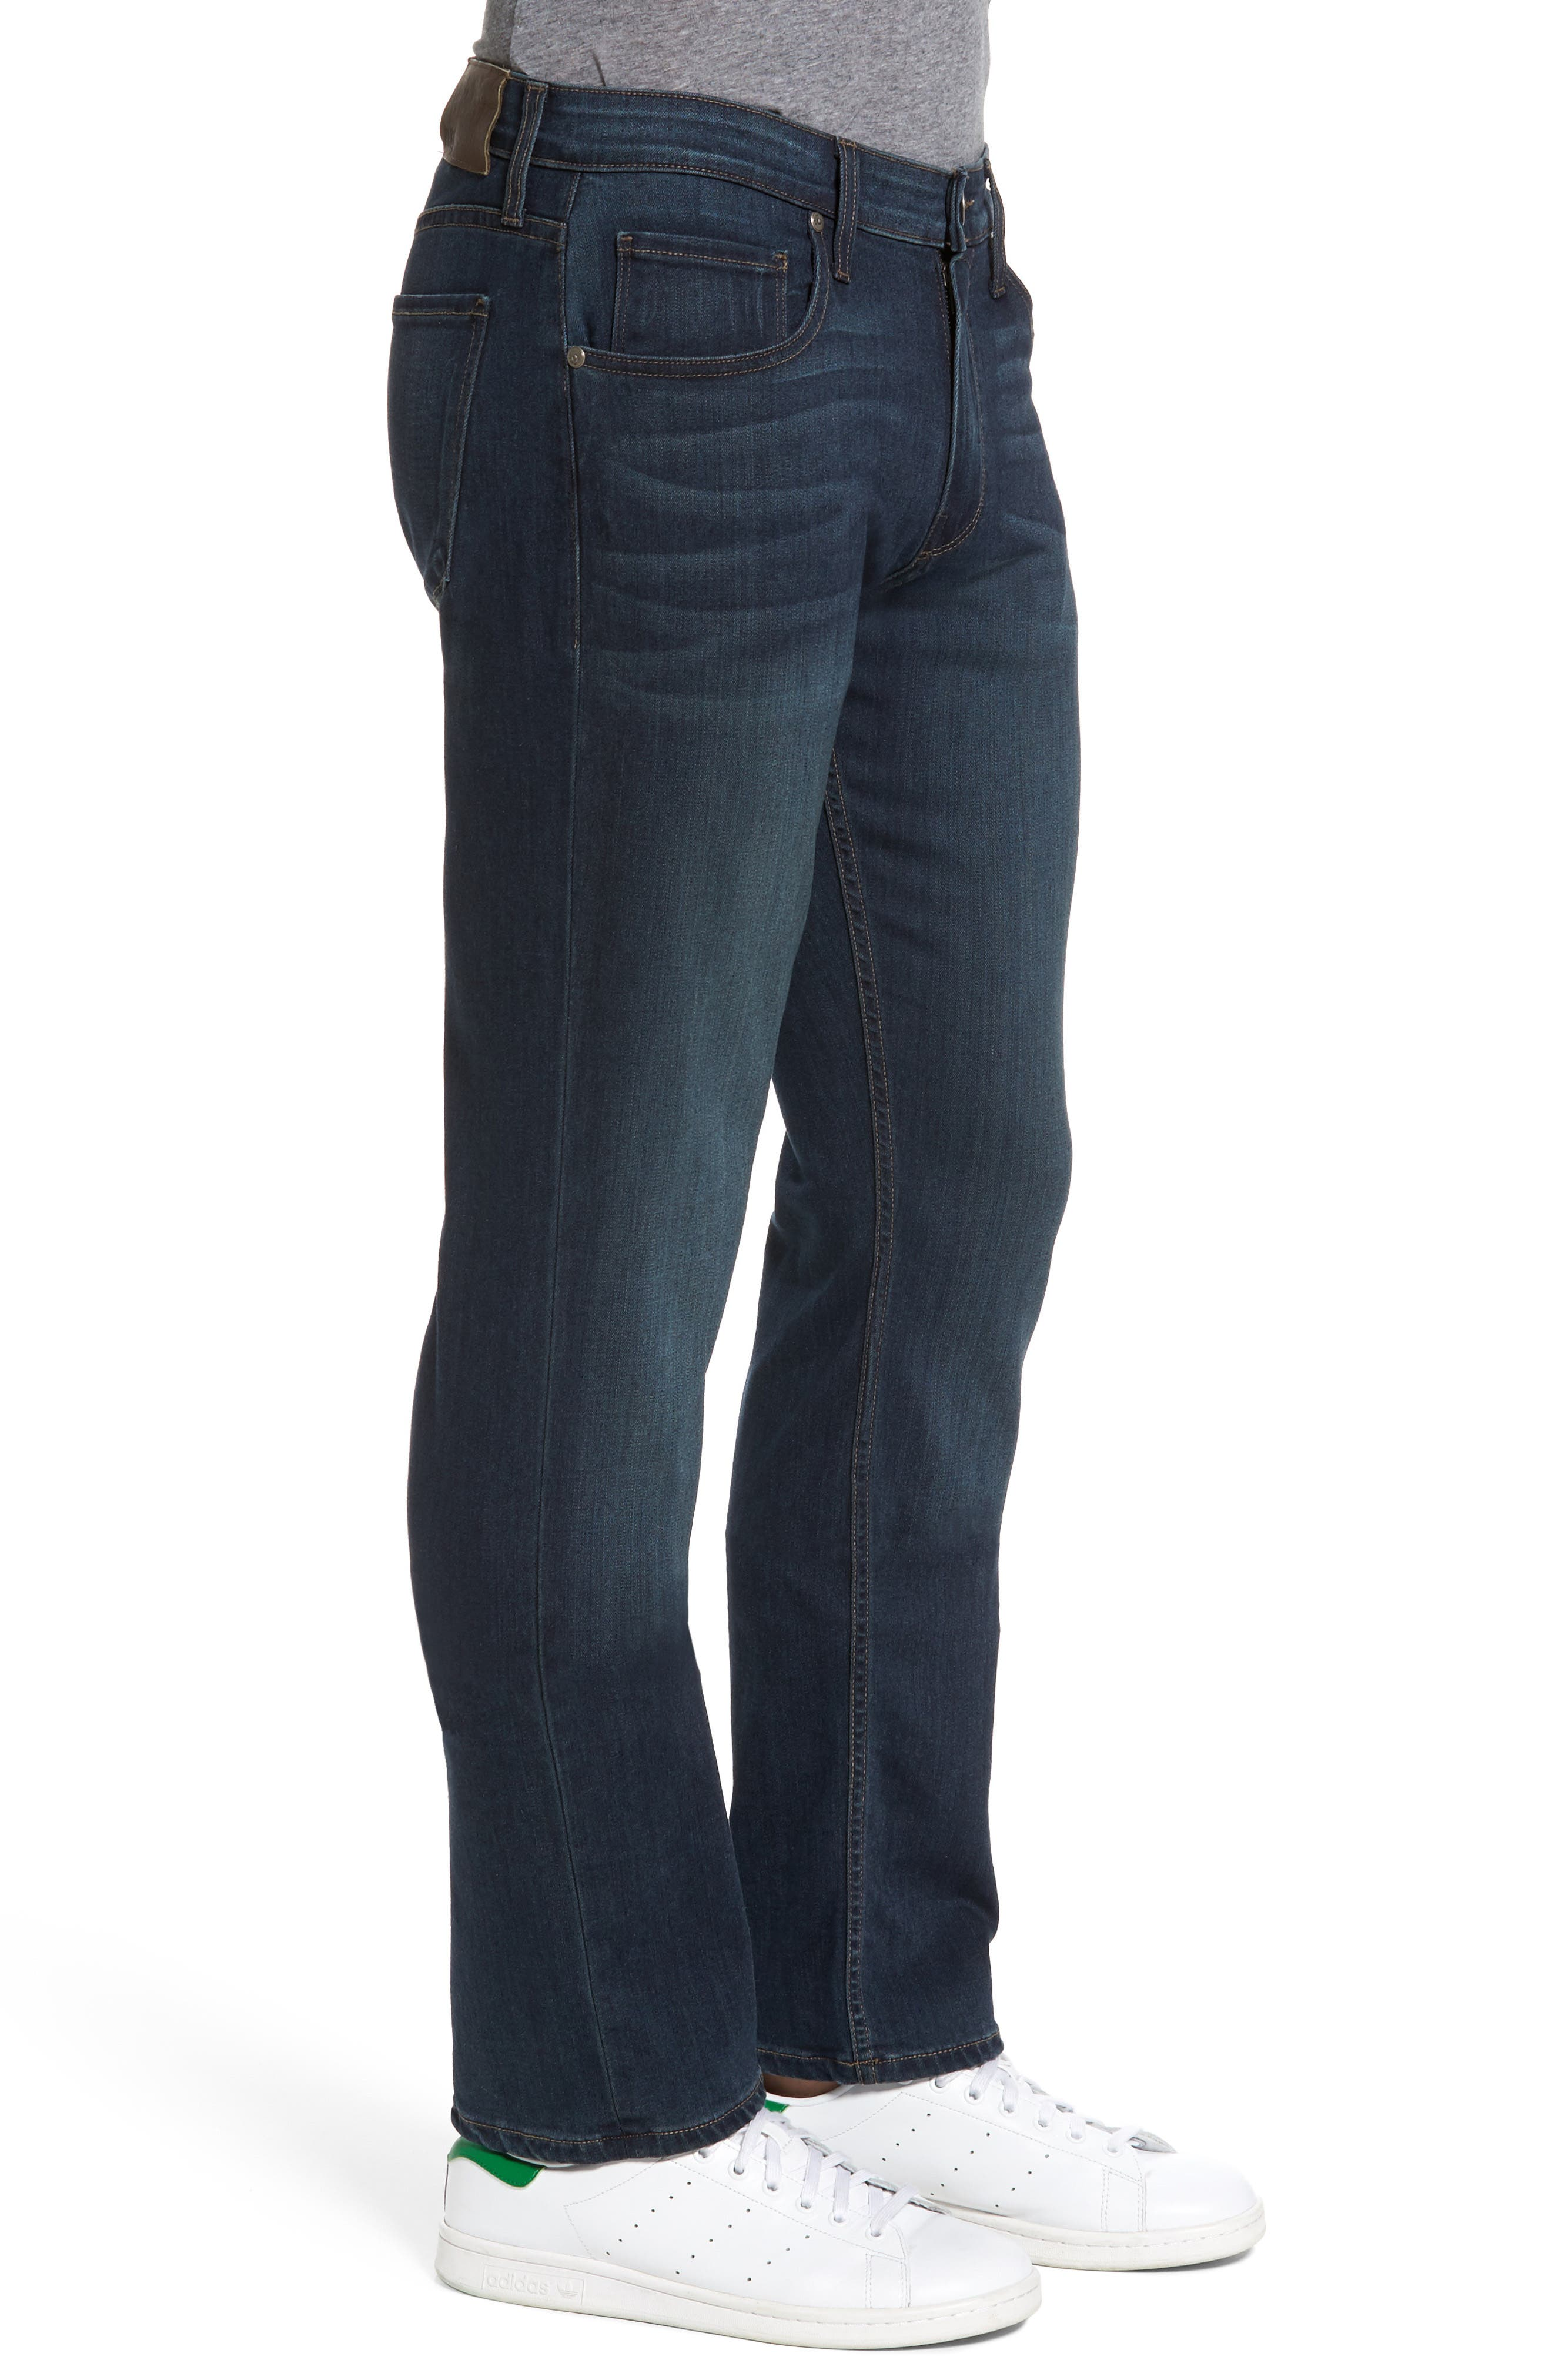 Normandie Straight Fit Jeans,                             Alternate thumbnail 3, color,                             400